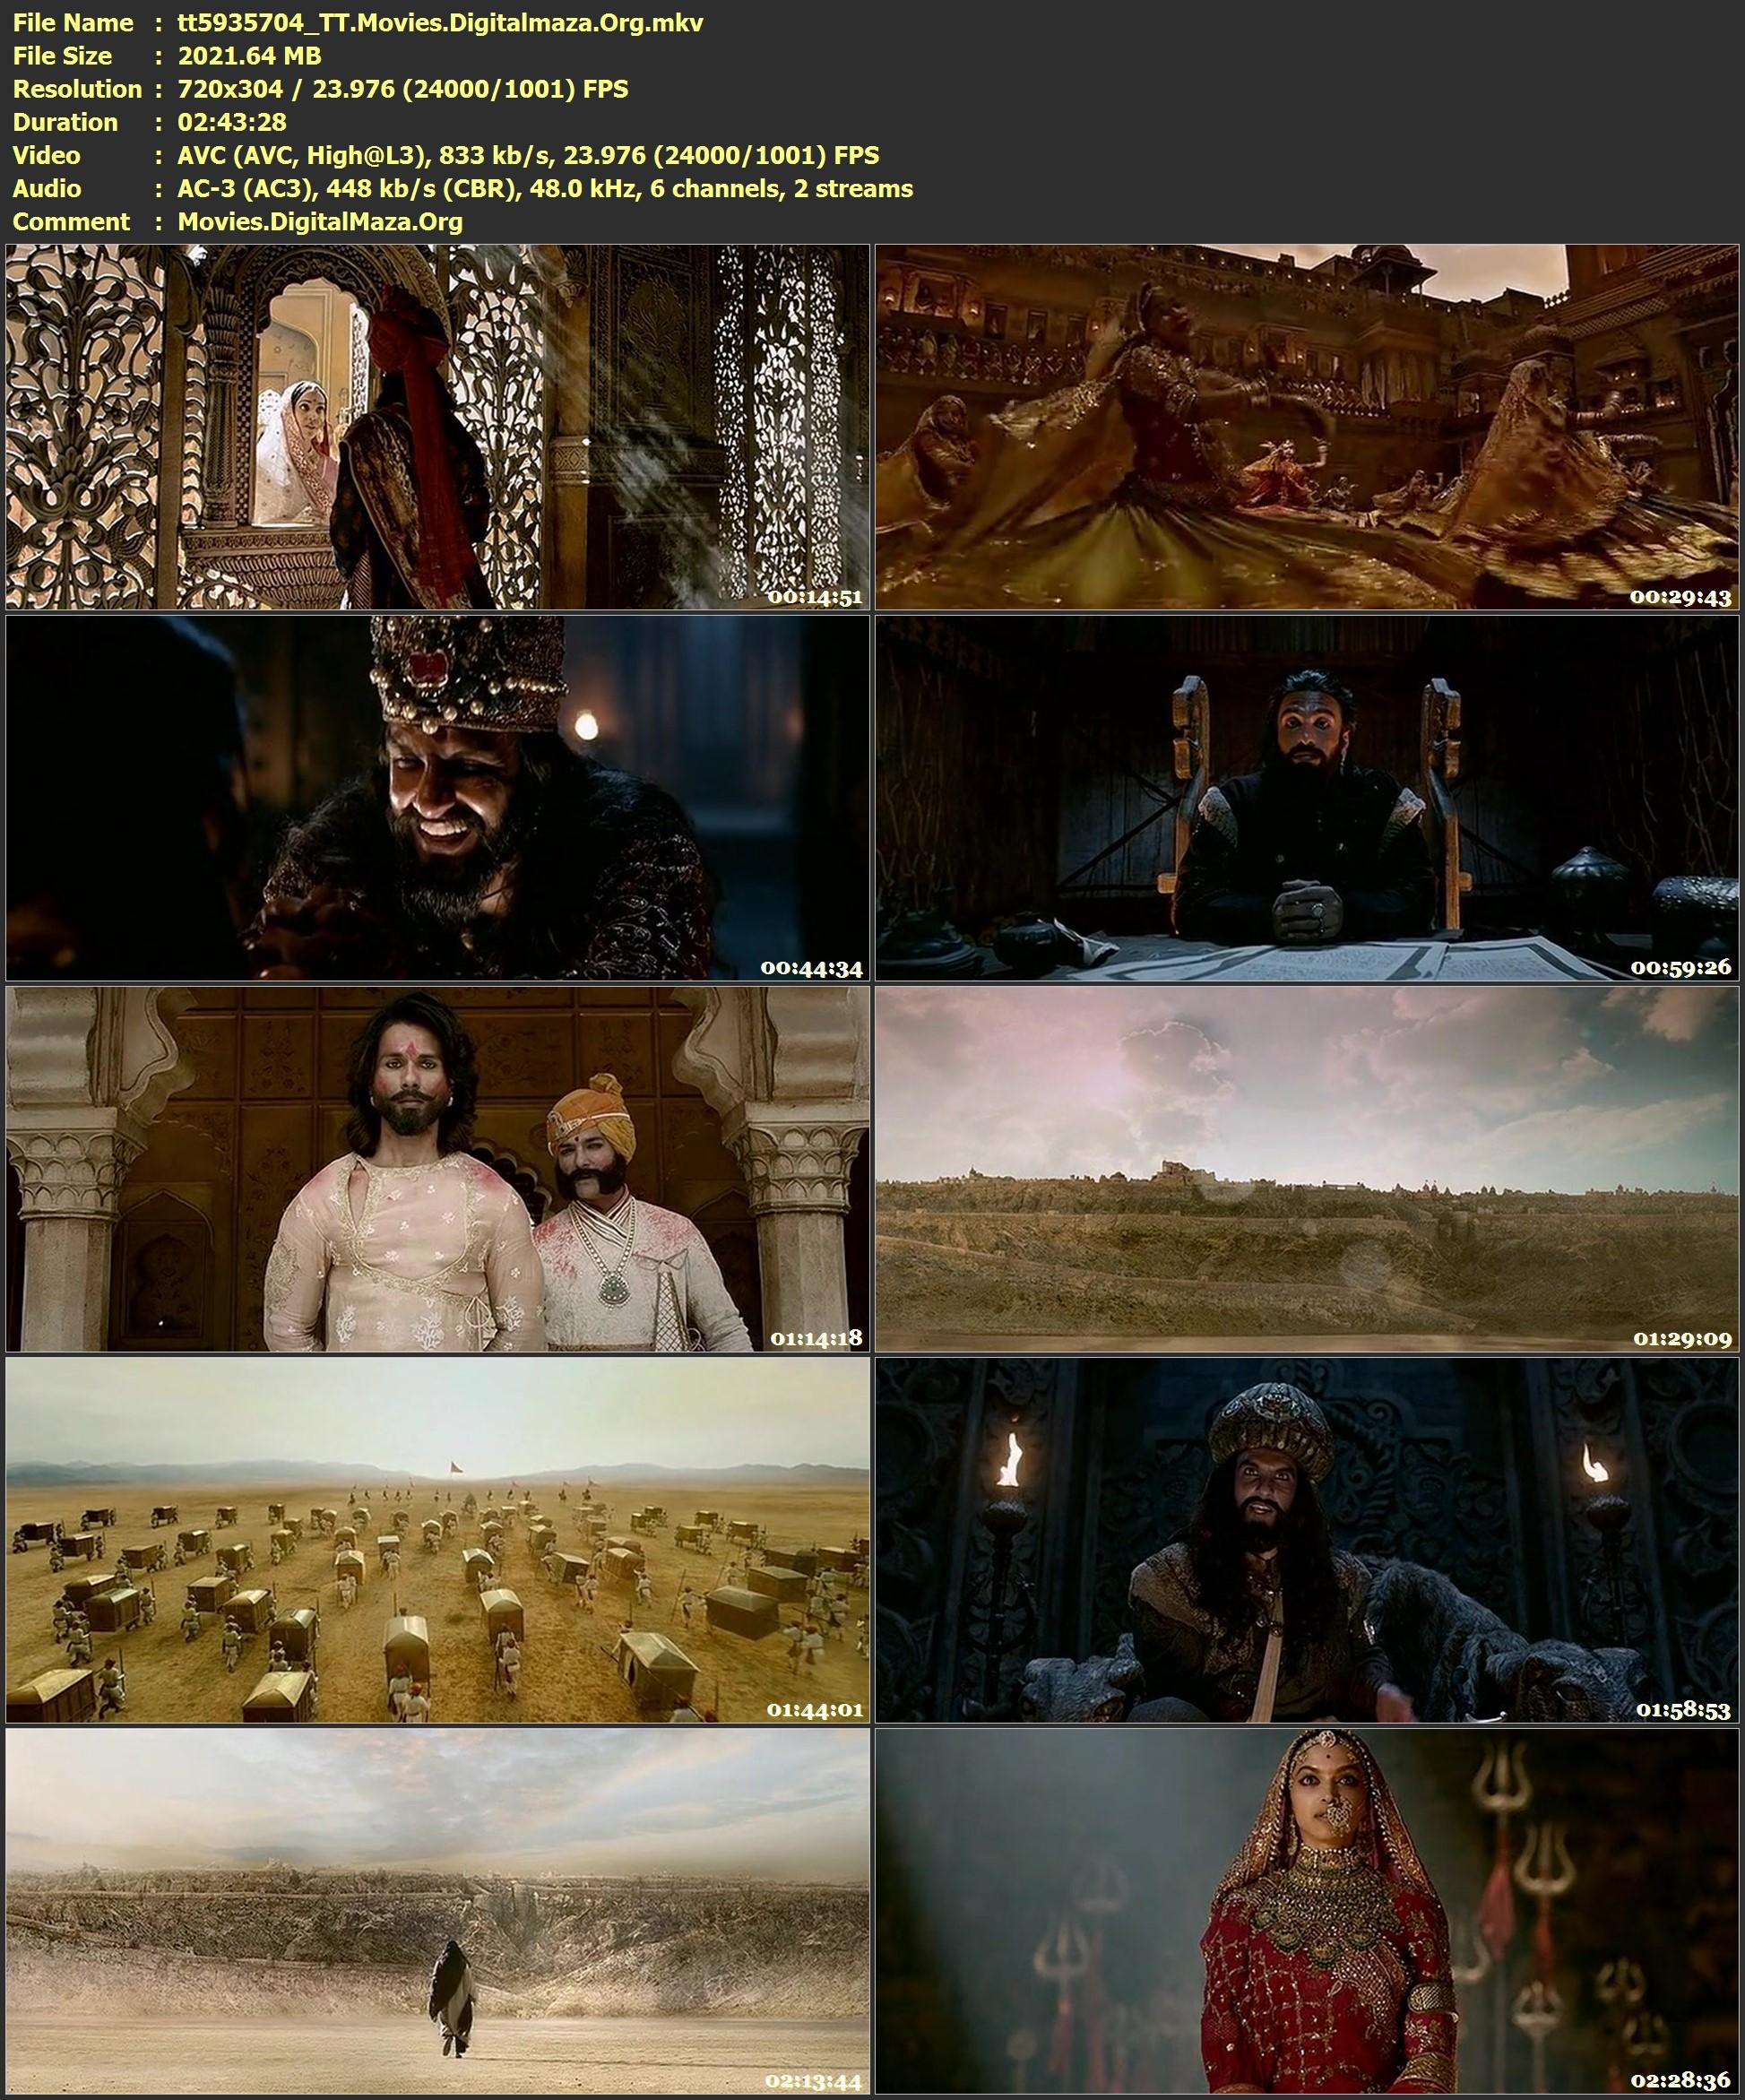 https://image.ibb.co/duRbcy/tt5935704_TT_Movies_Digitalmaza_Org_mkv.jpg